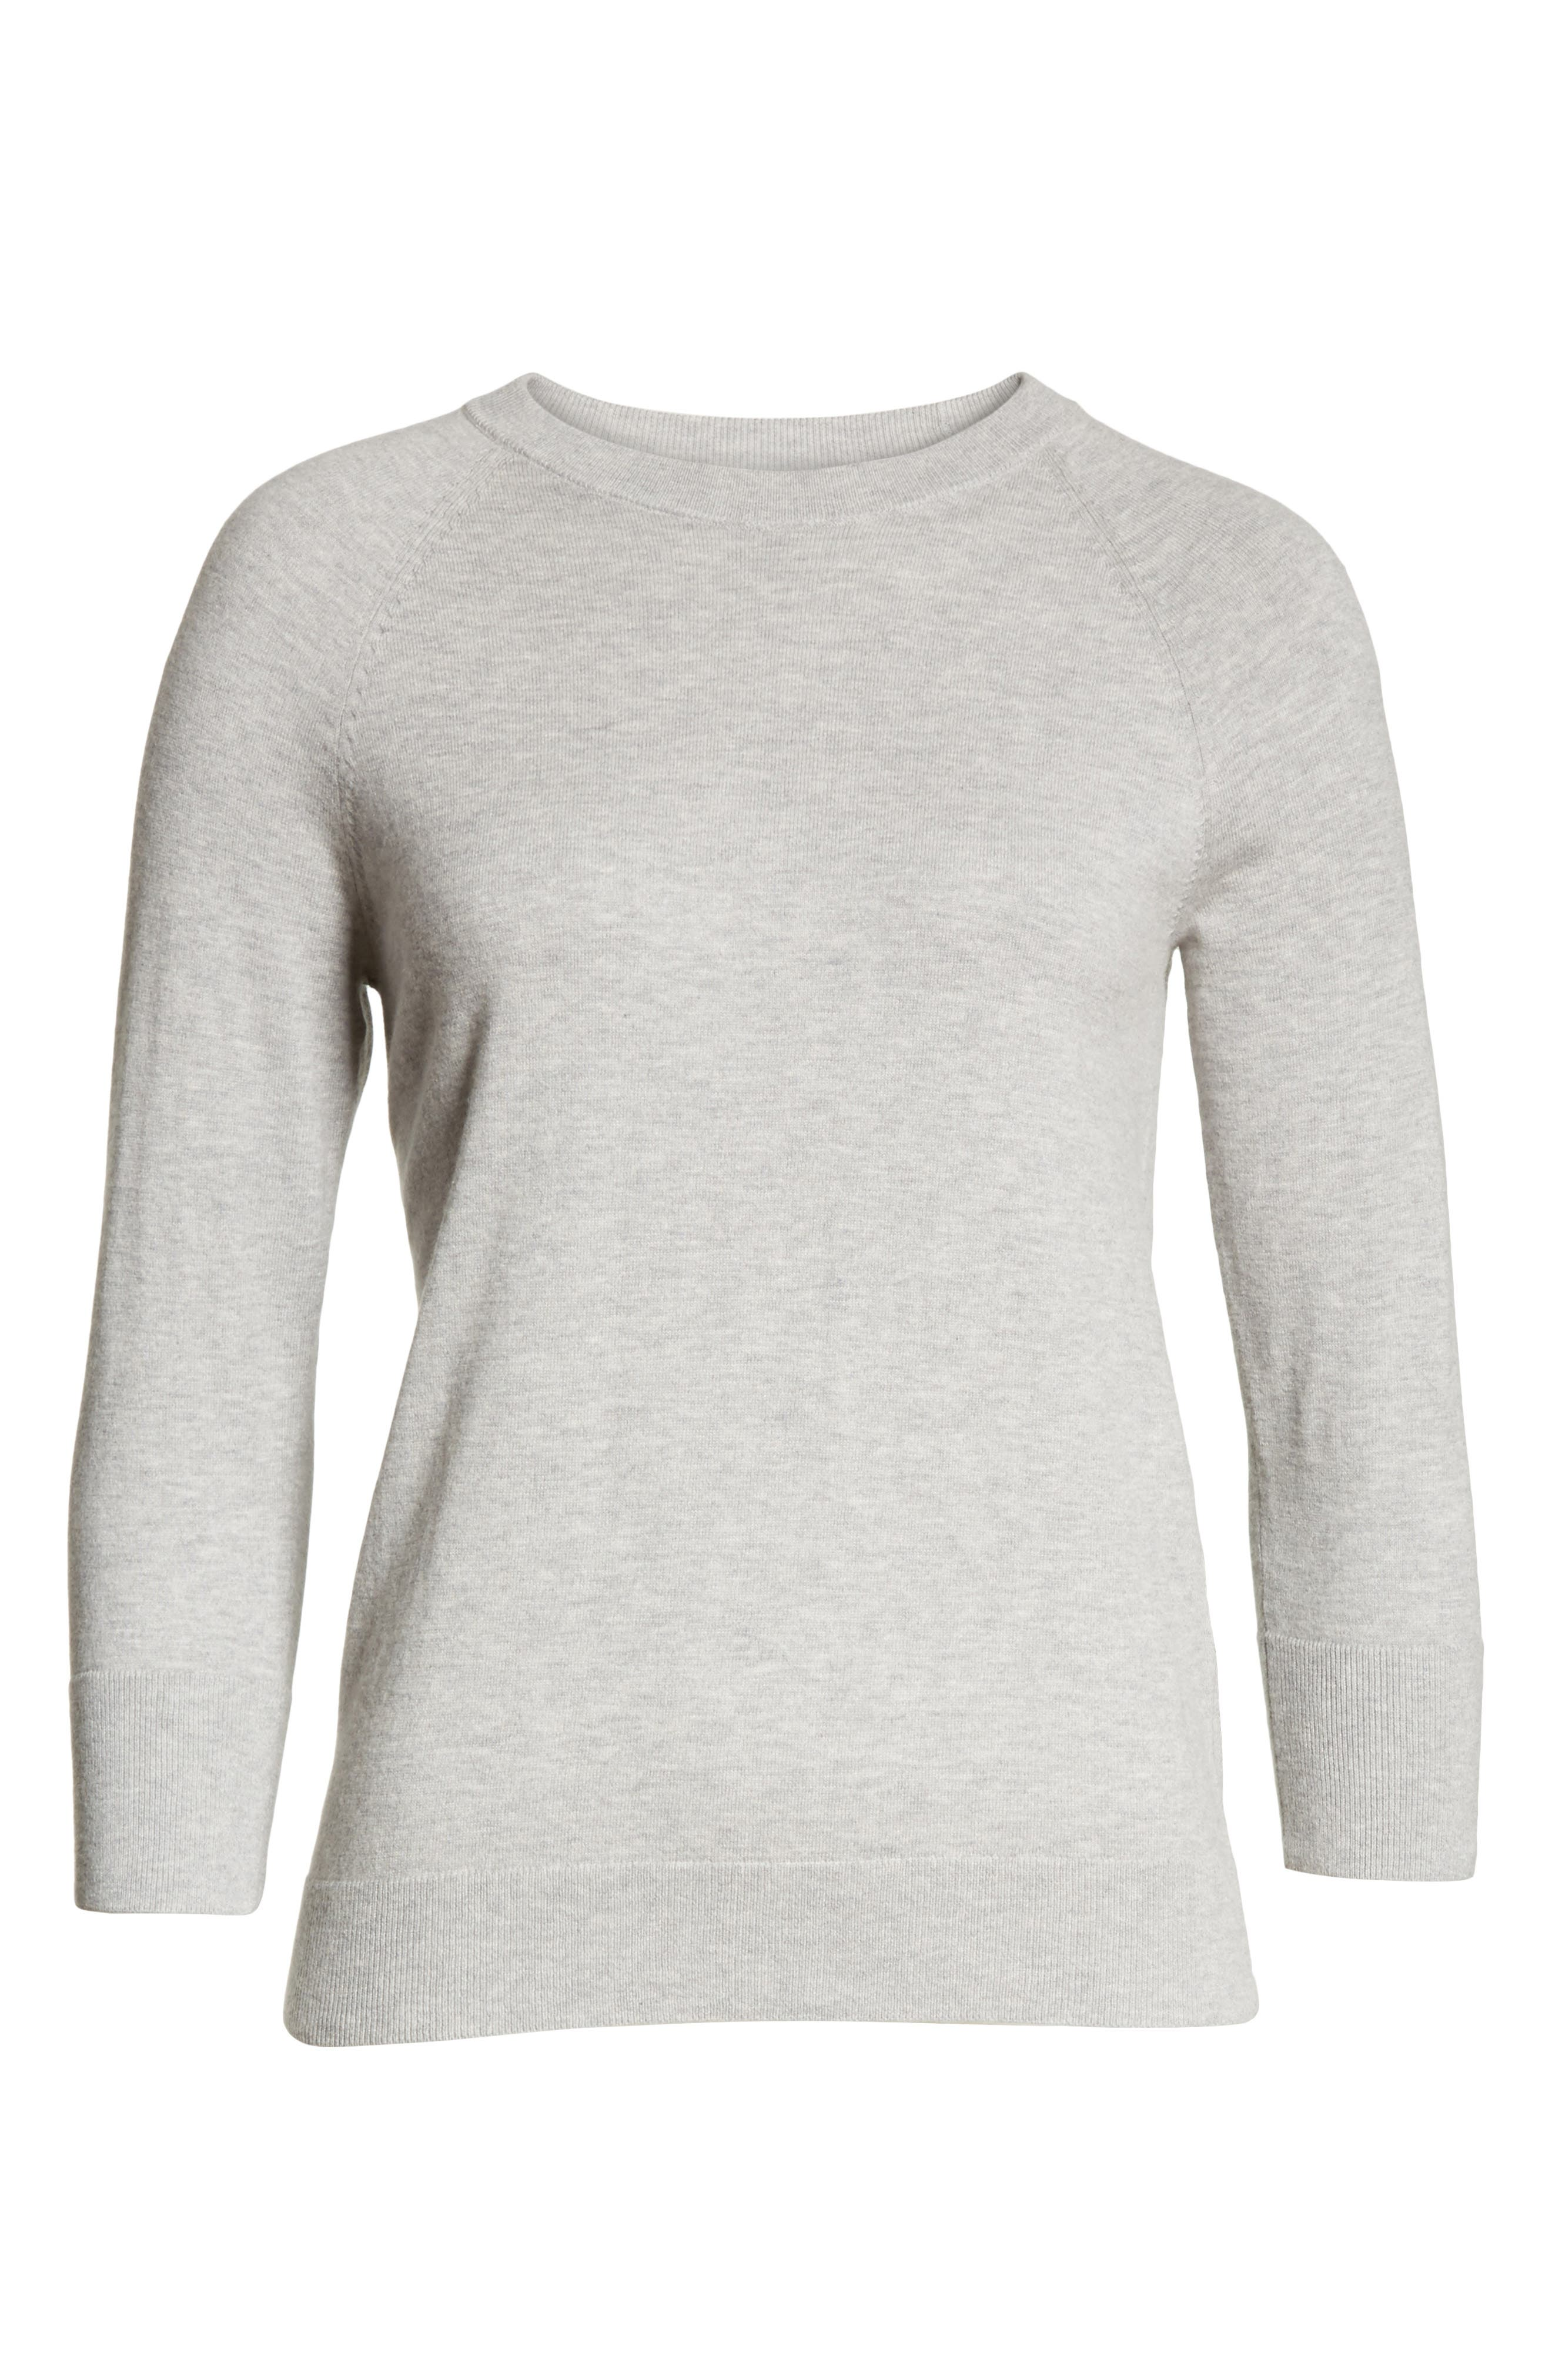 Cotton & Cashmere Sweater,                             Alternate thumbnail 6, color,                             Light Heather Grey